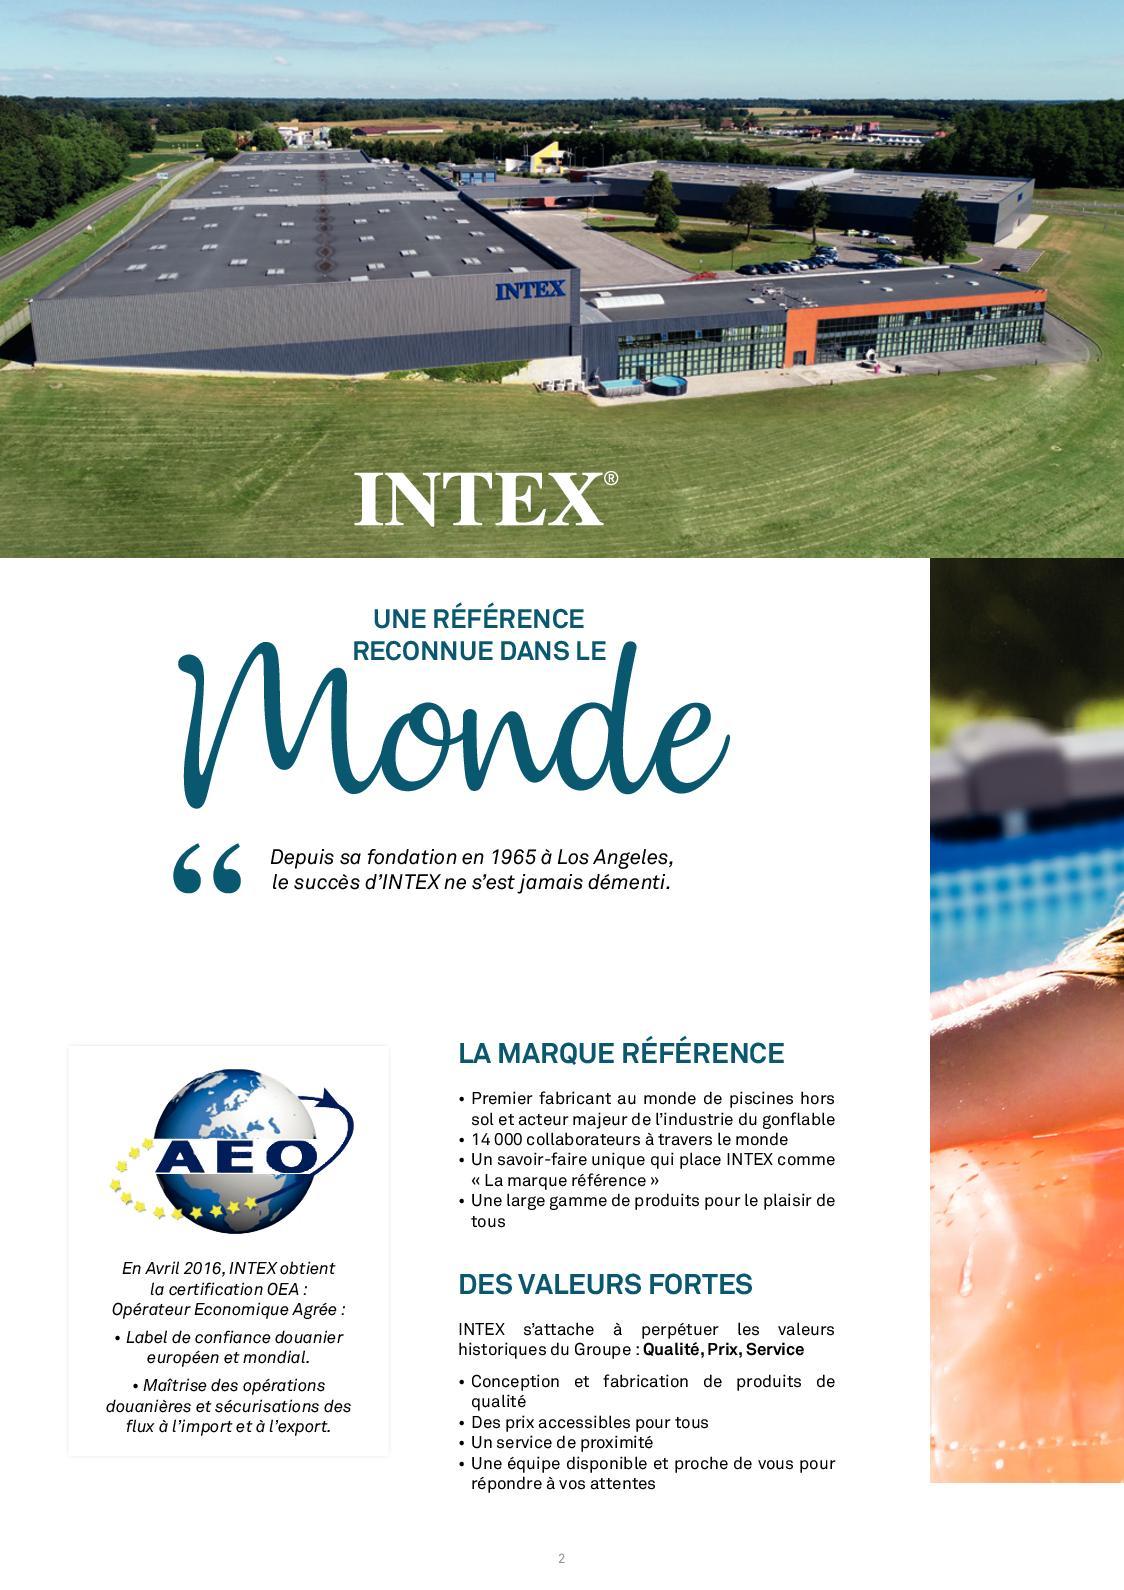 Web Catalogue Intex 2019 - CALAMEO Downloader